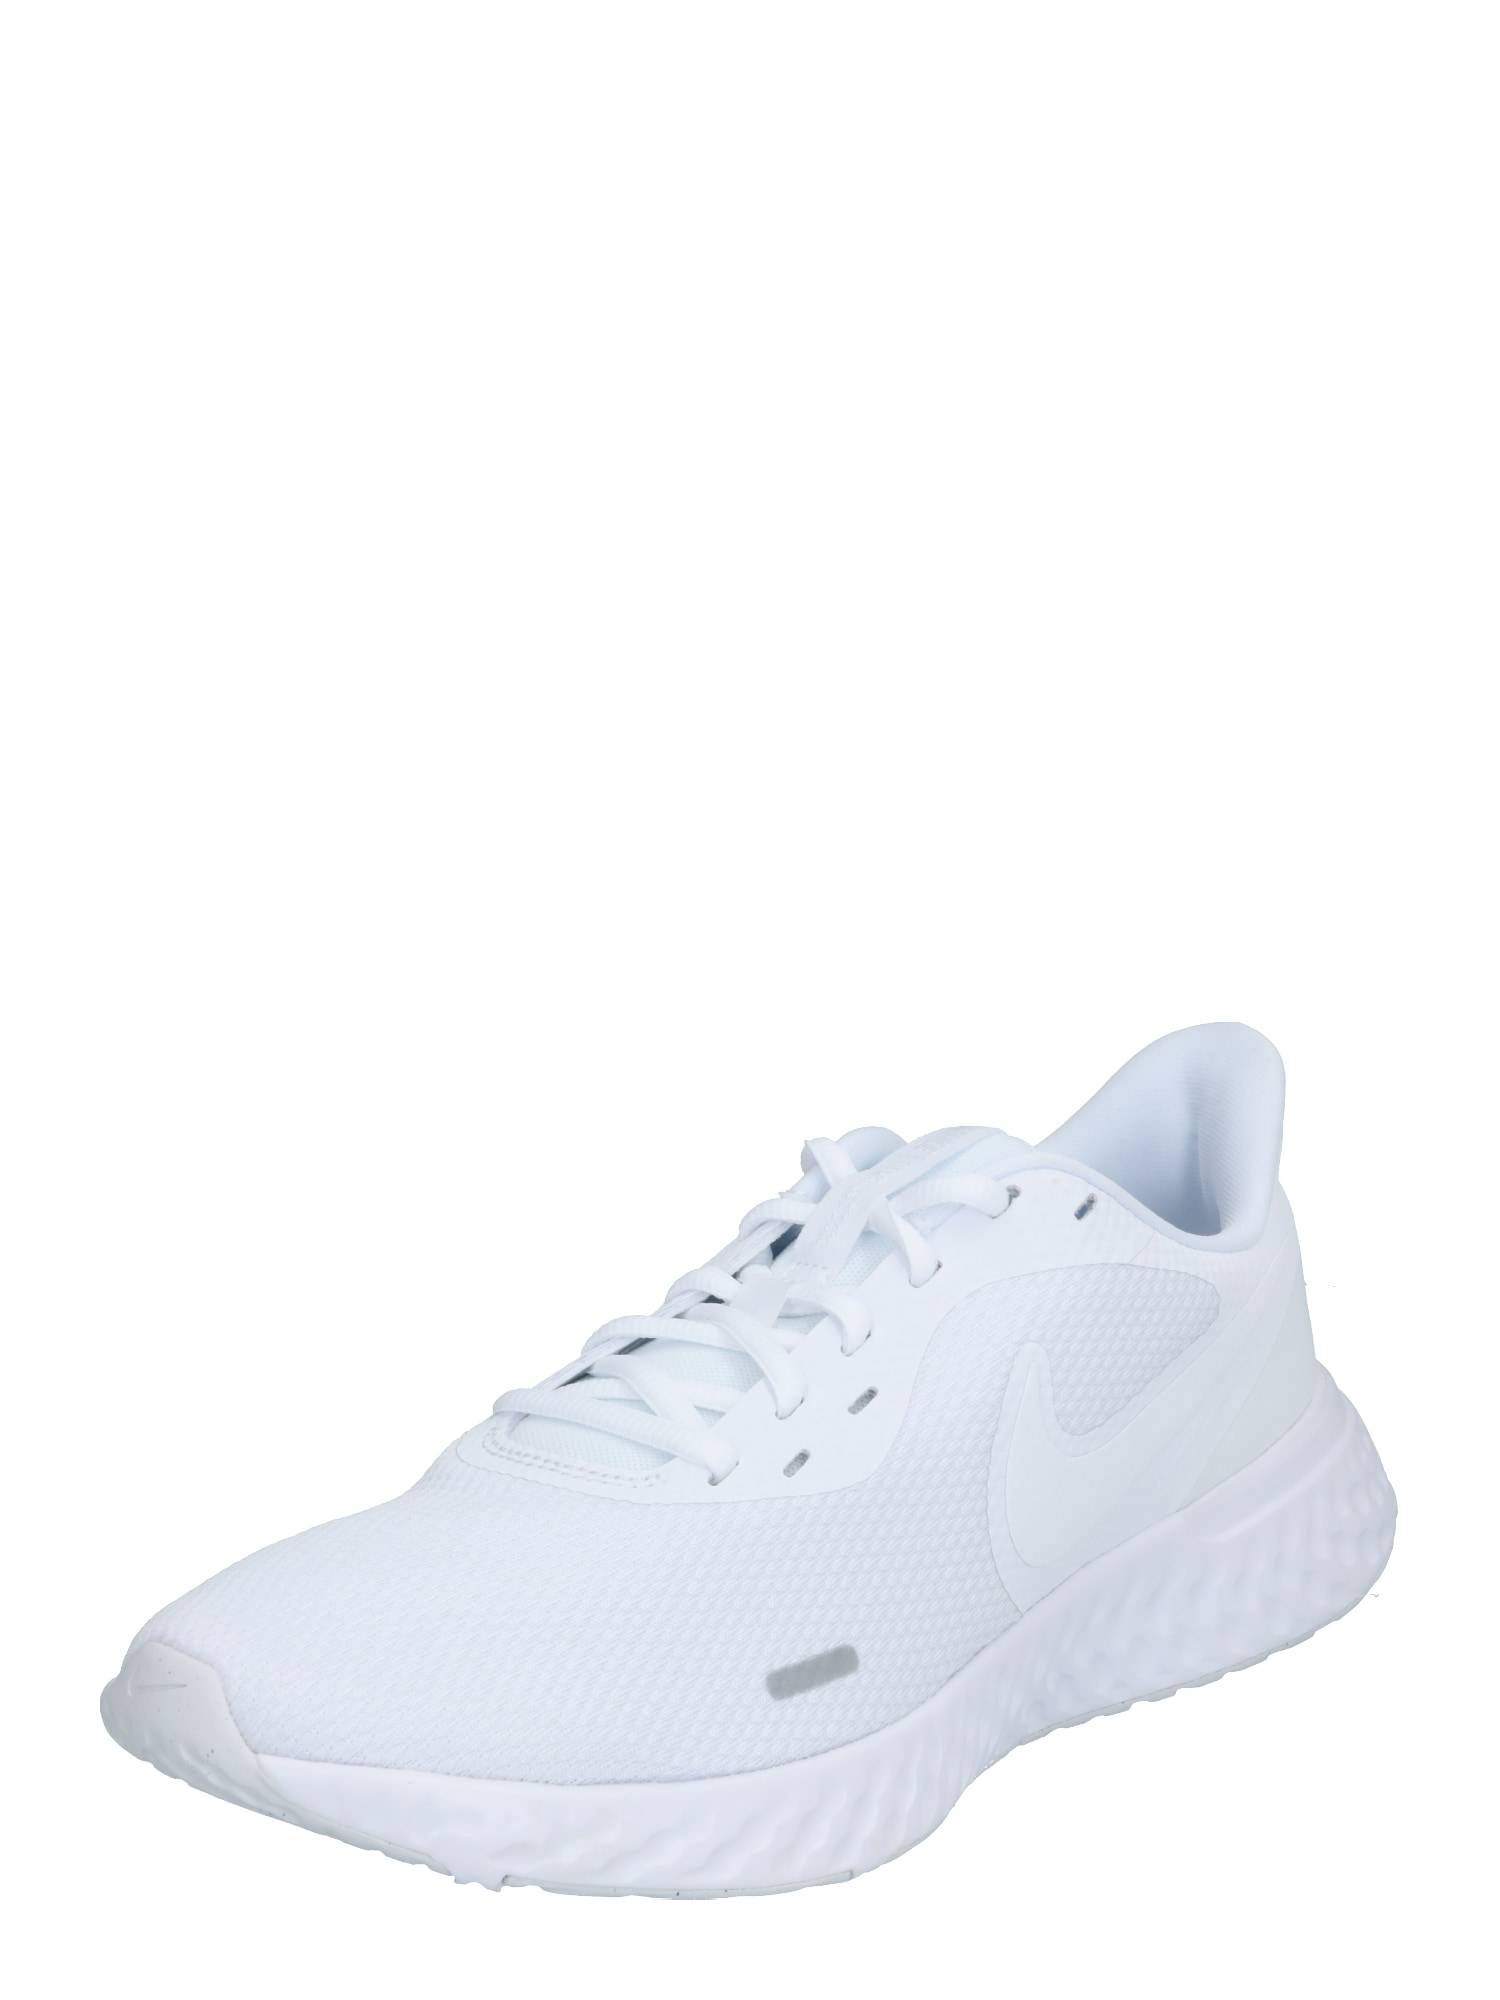 NIKE Chaussure de course 'Revolution 5'  - Blanc - Taille: 13 - male